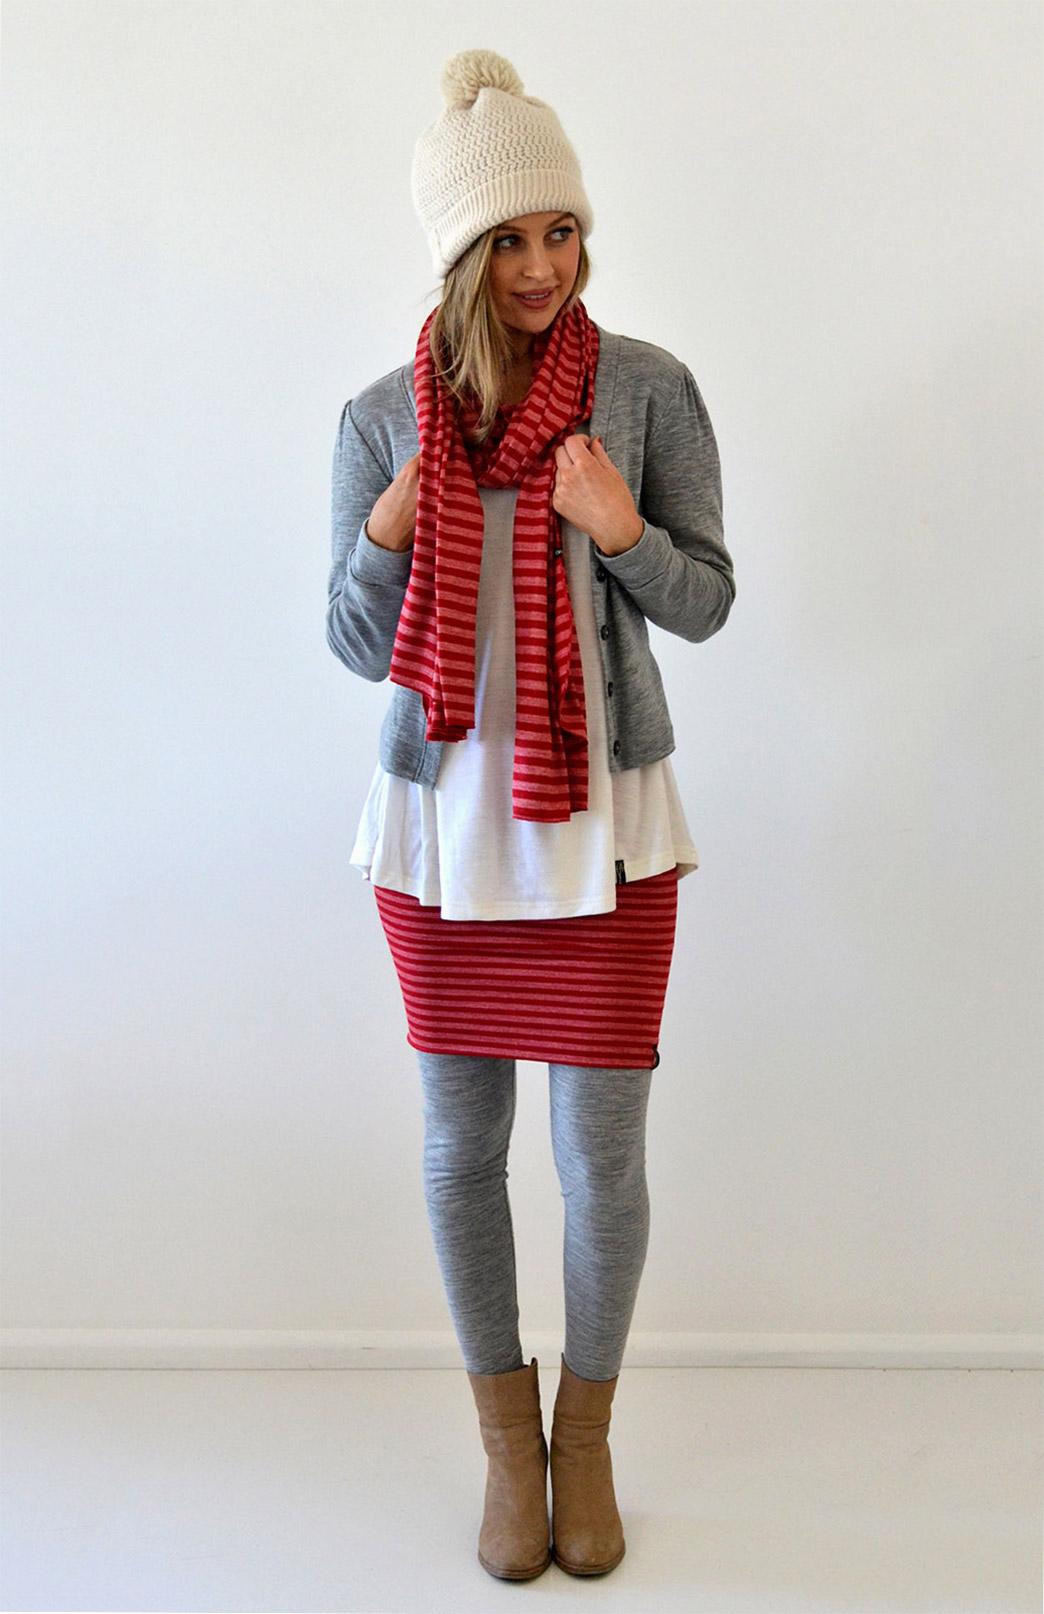 Scarves - Patterned - Women's Superfine Merino Wool & Modal Blend Classic Wide Scarf - Smitten Merino Tasmania Australia